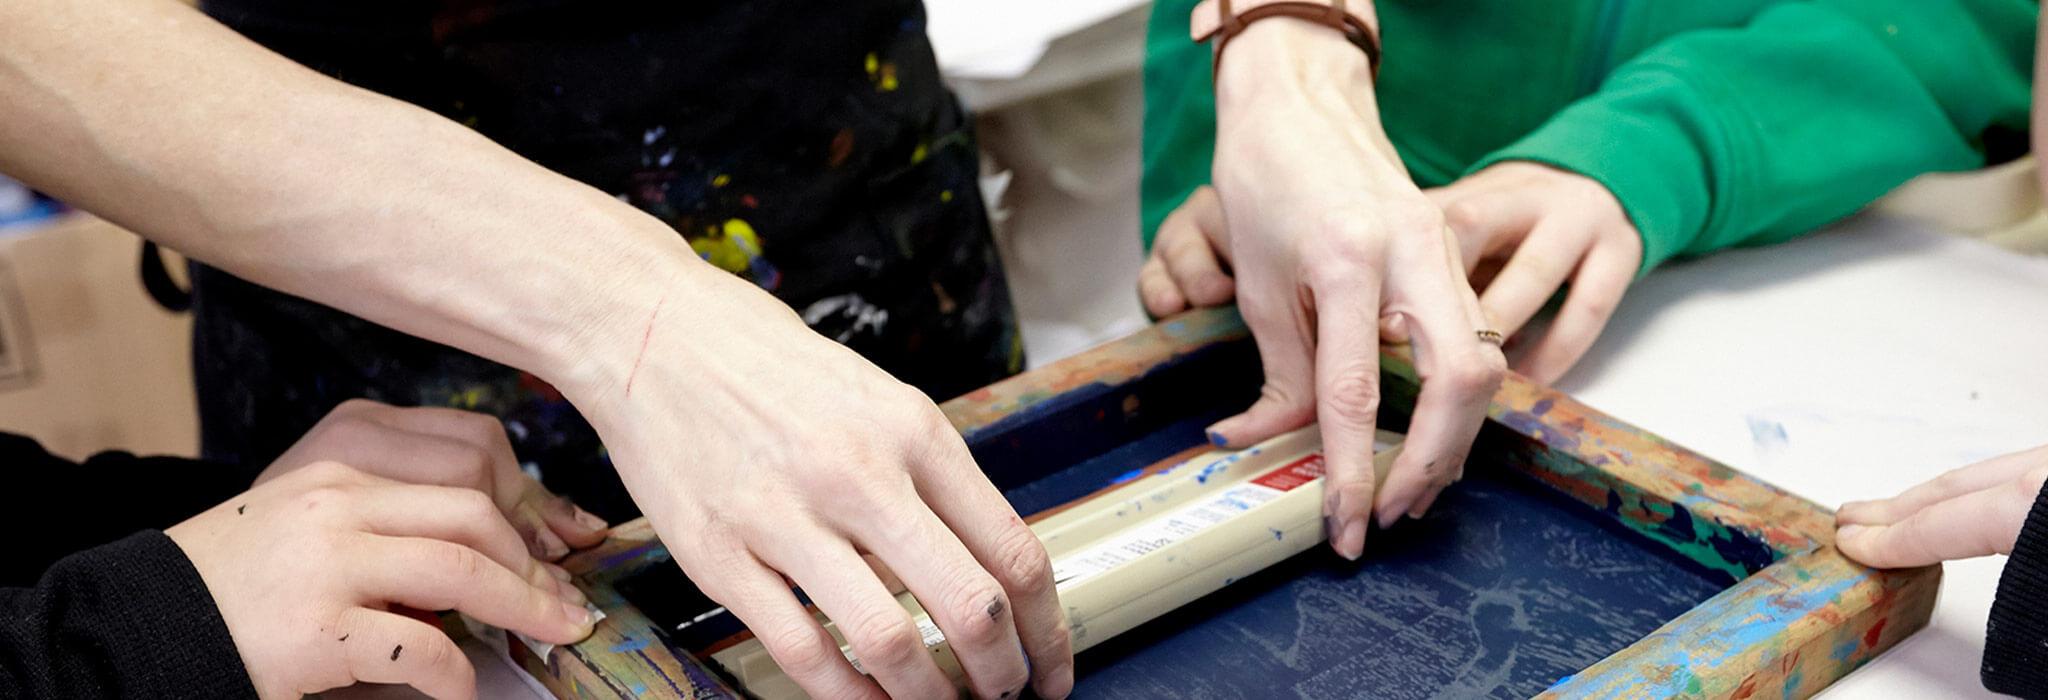 Art Gallery of Hamilton - Educators - Studio Programs